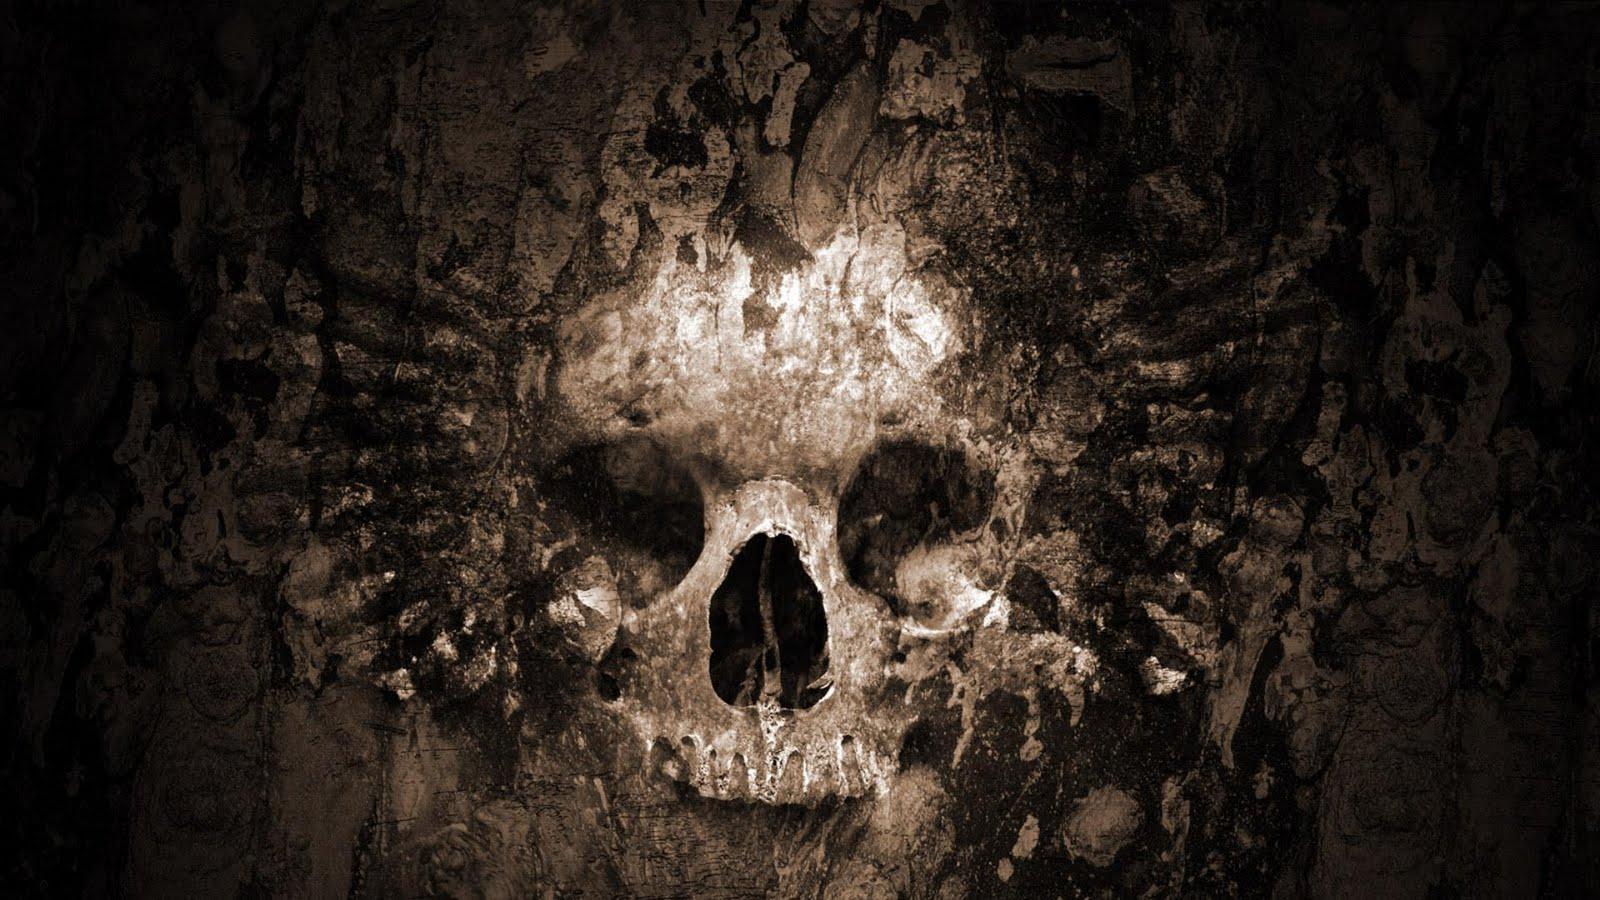 http://1.bp.blogspot.com/-3eg7eqEz4o0/TgdrYltJlsI/AAAAAAAAEoQ/JqZchF75Eb0/s1600/Skull.jpg